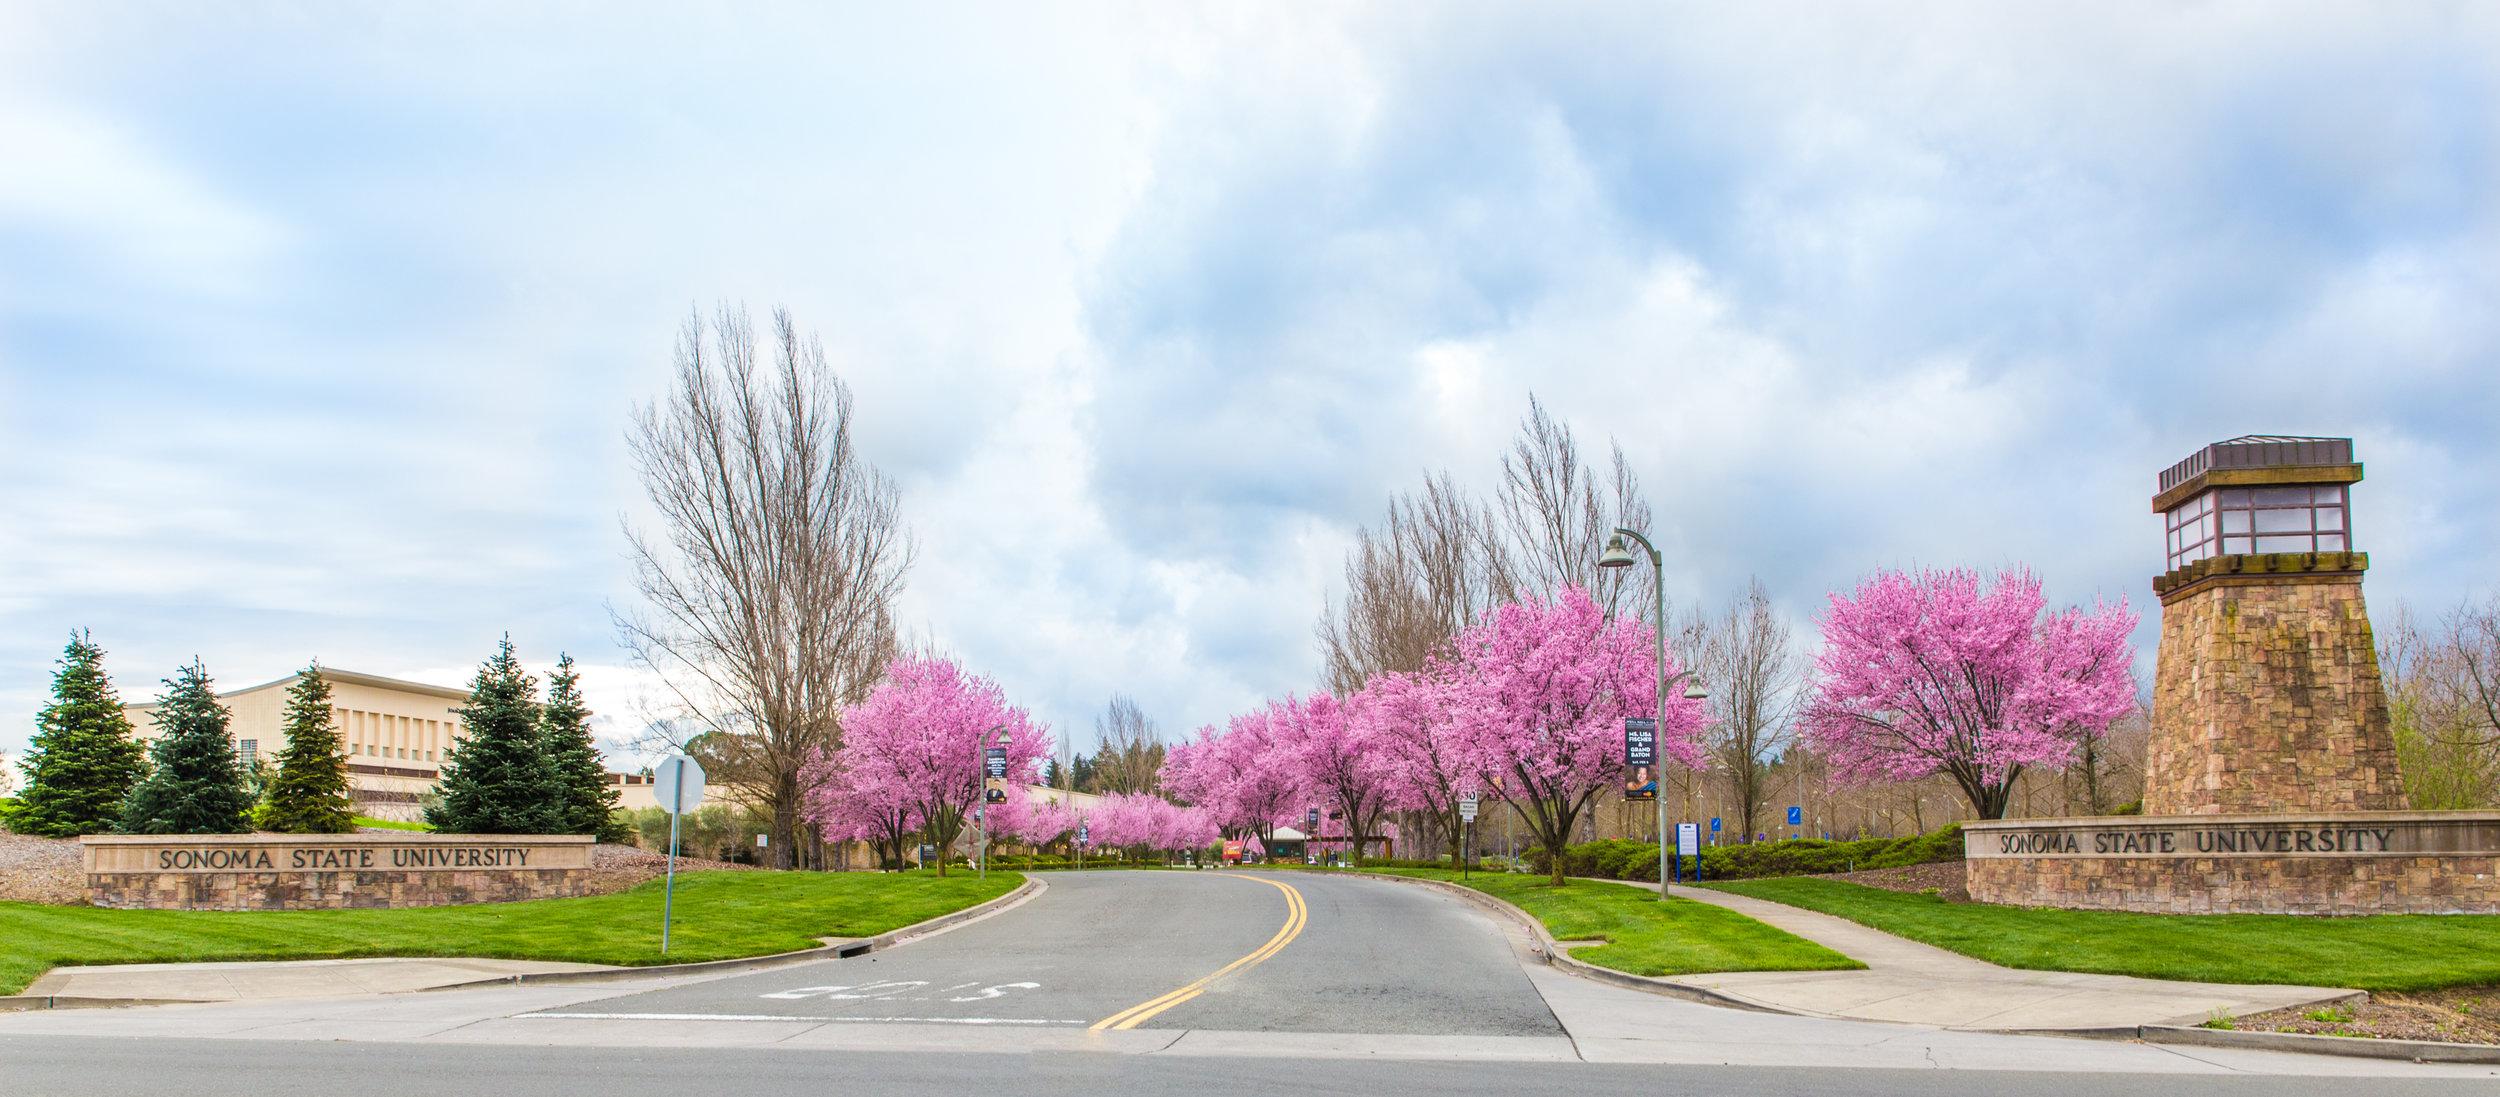 Sonoma State University ranks high in annual Princeton